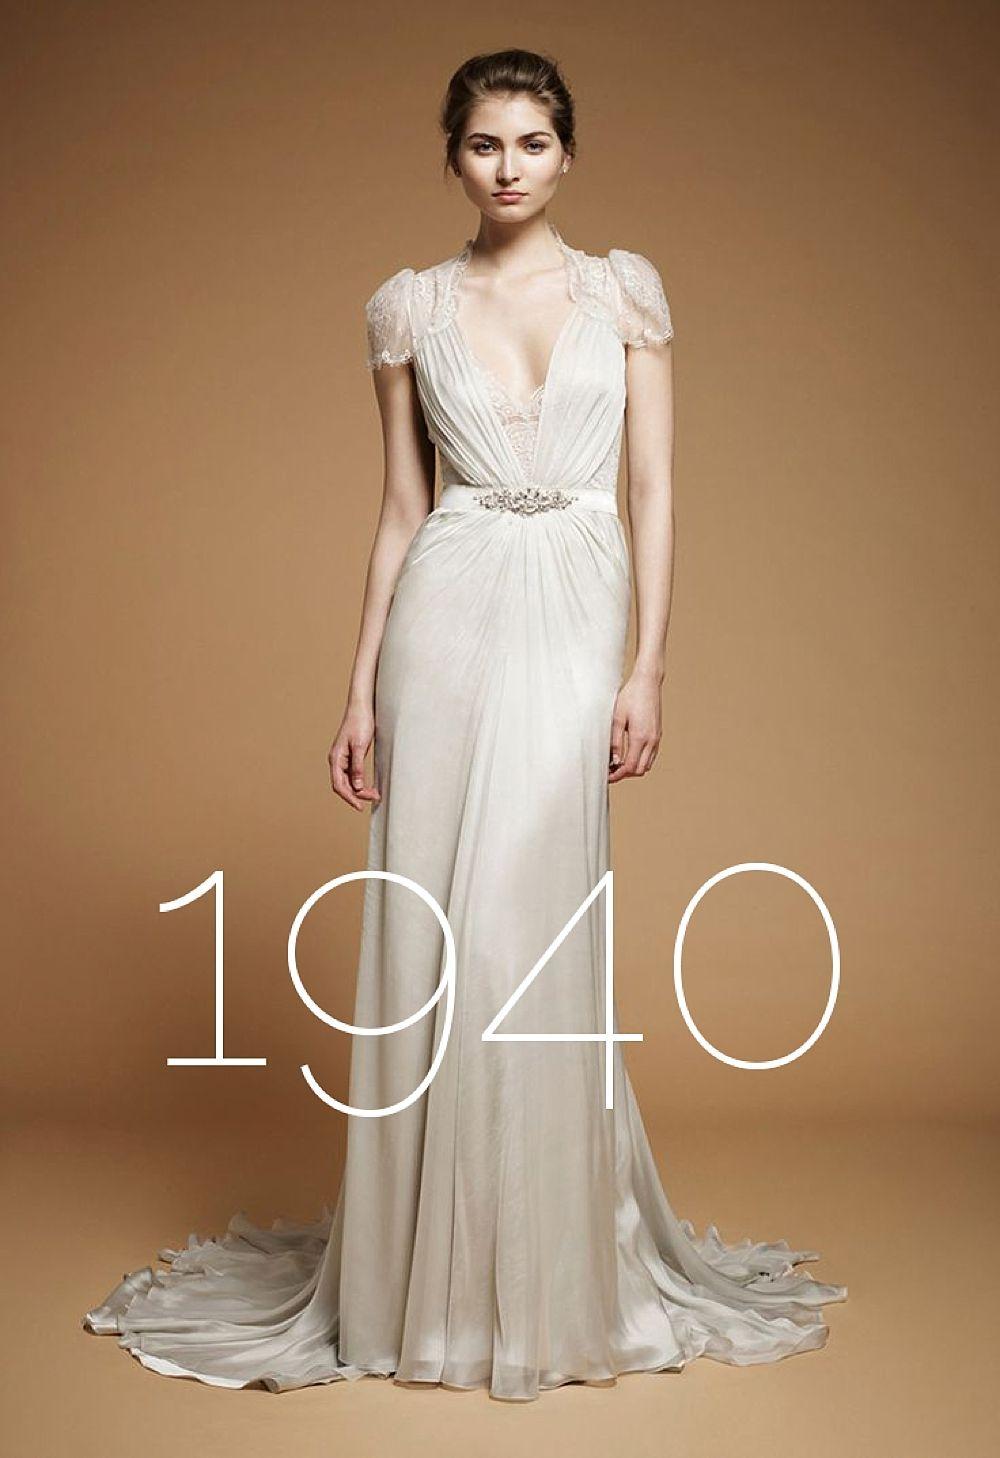 1940 wedding dress  Pin by Lydia Ashcroft on Wedding  Pinterest  Wedding dress